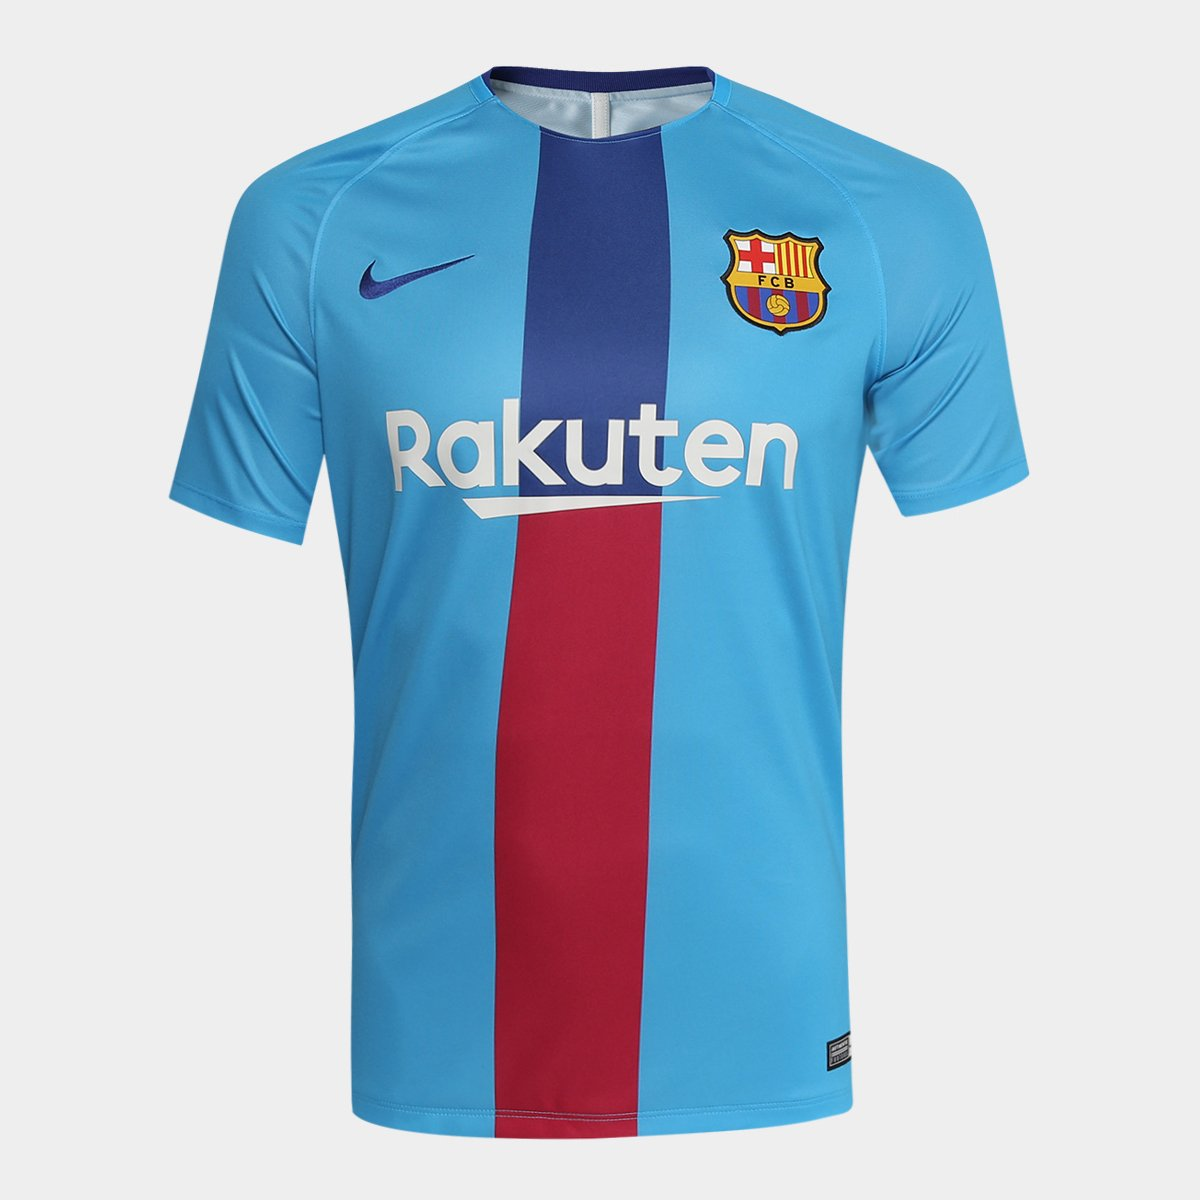 945a37add Camisa do Barcelona 19 20 Treino Nike Masculina - Azul Royal - Compre Agora